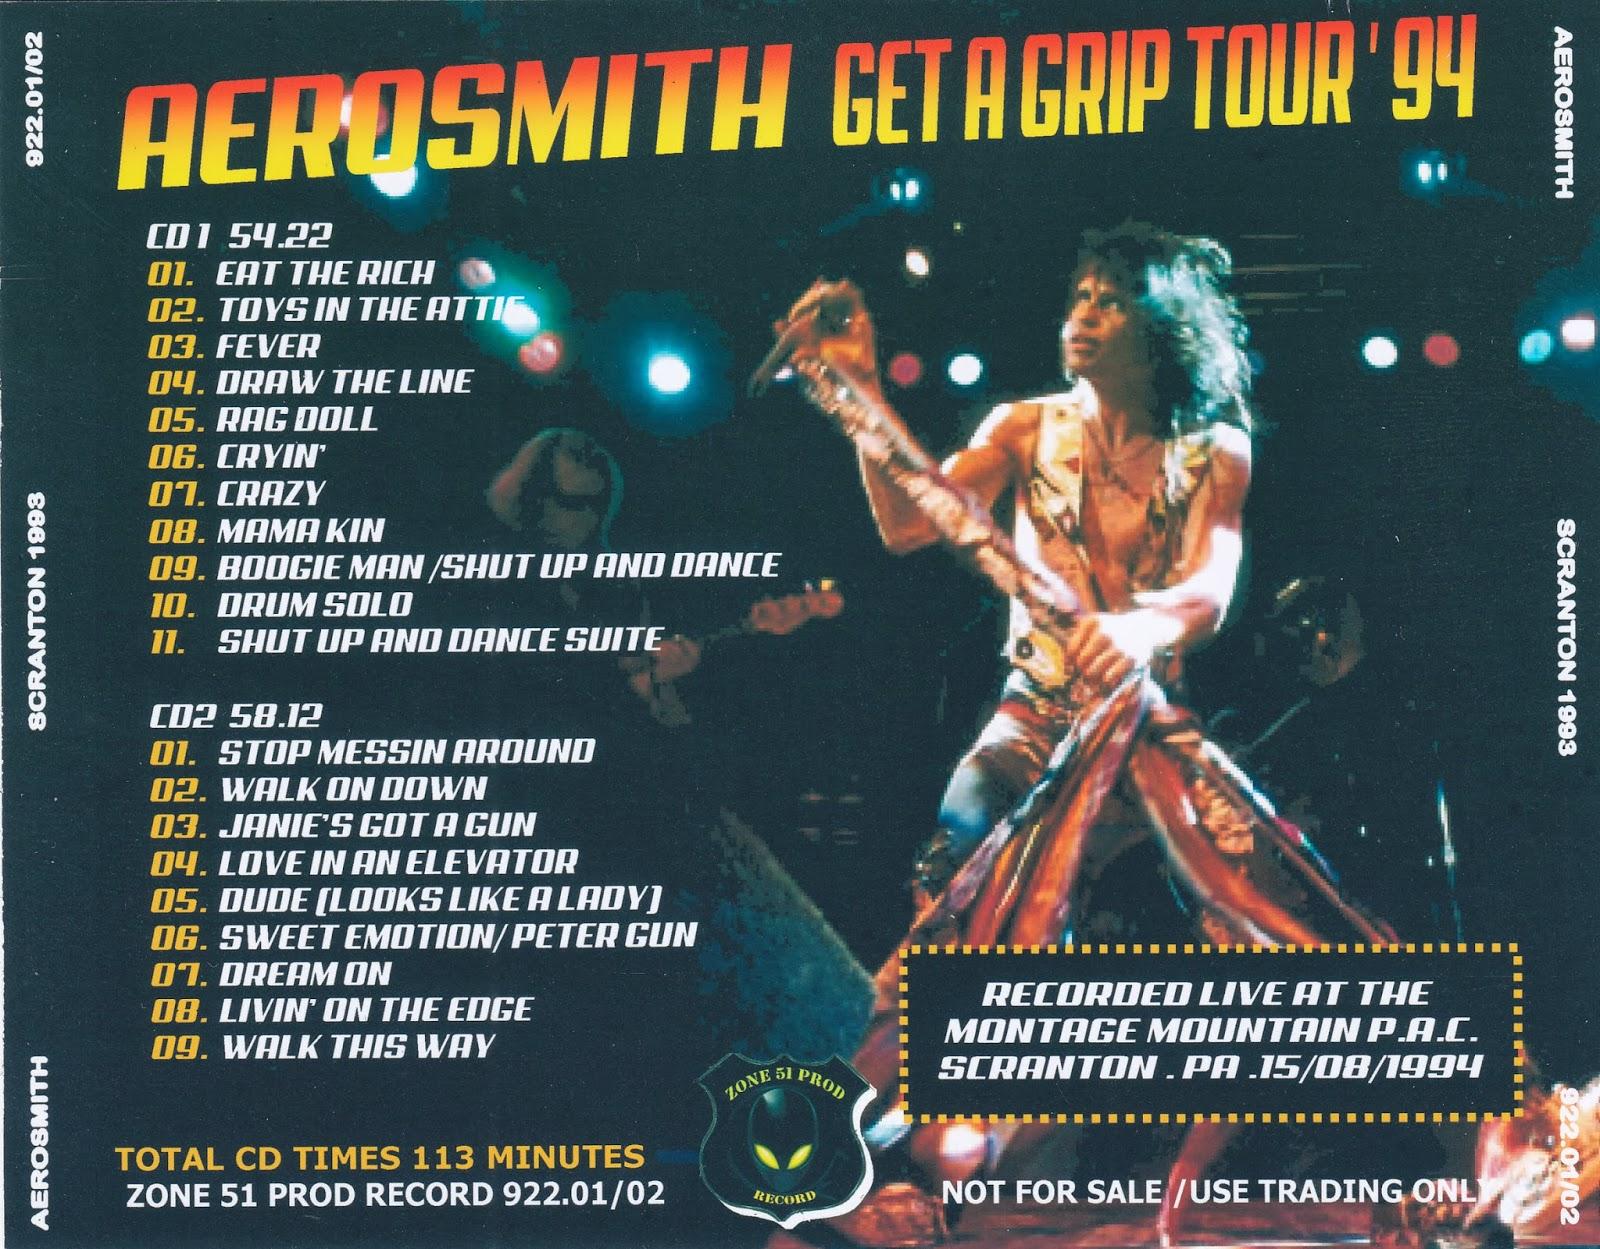 Aerosmith Bootlegs Cover Arts Scranton 1994